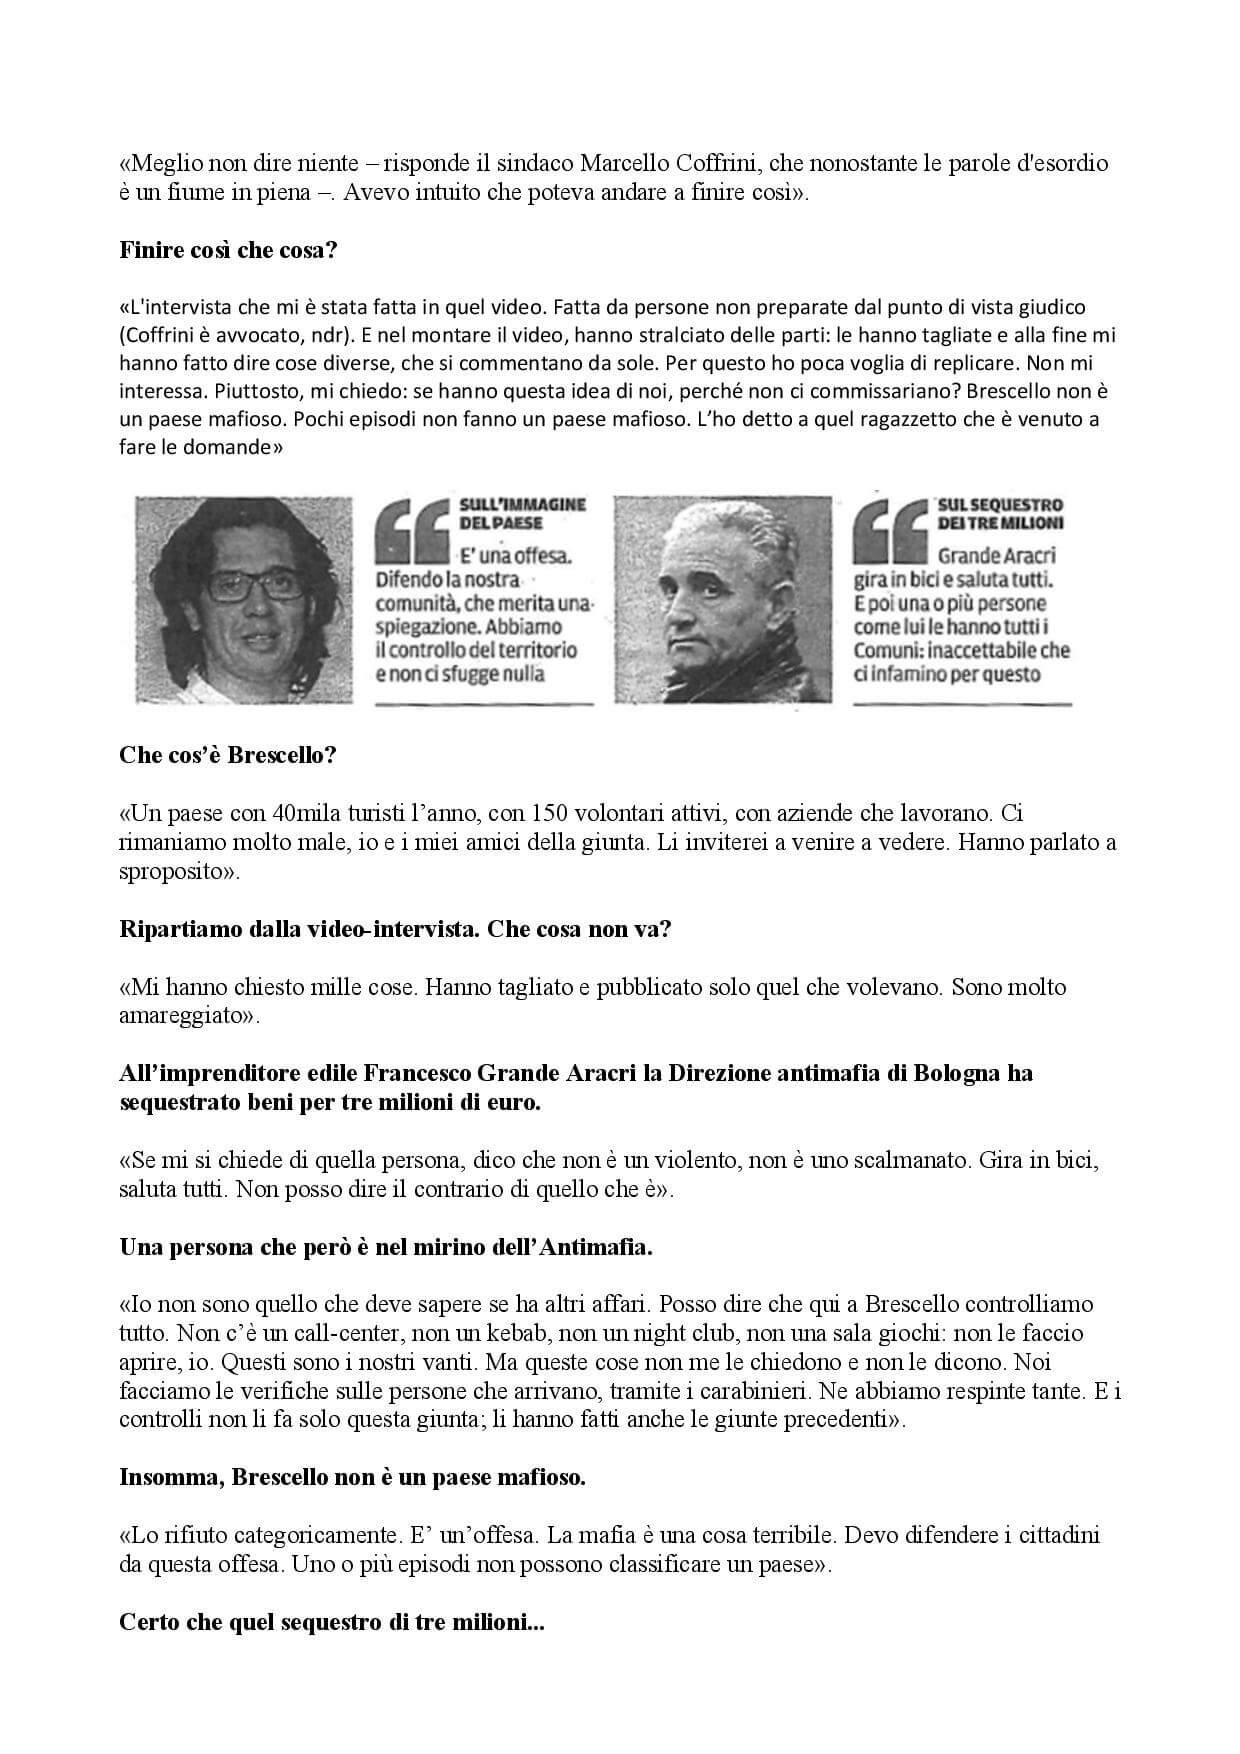 20_9_14_gdr_grasselli-1-page-002